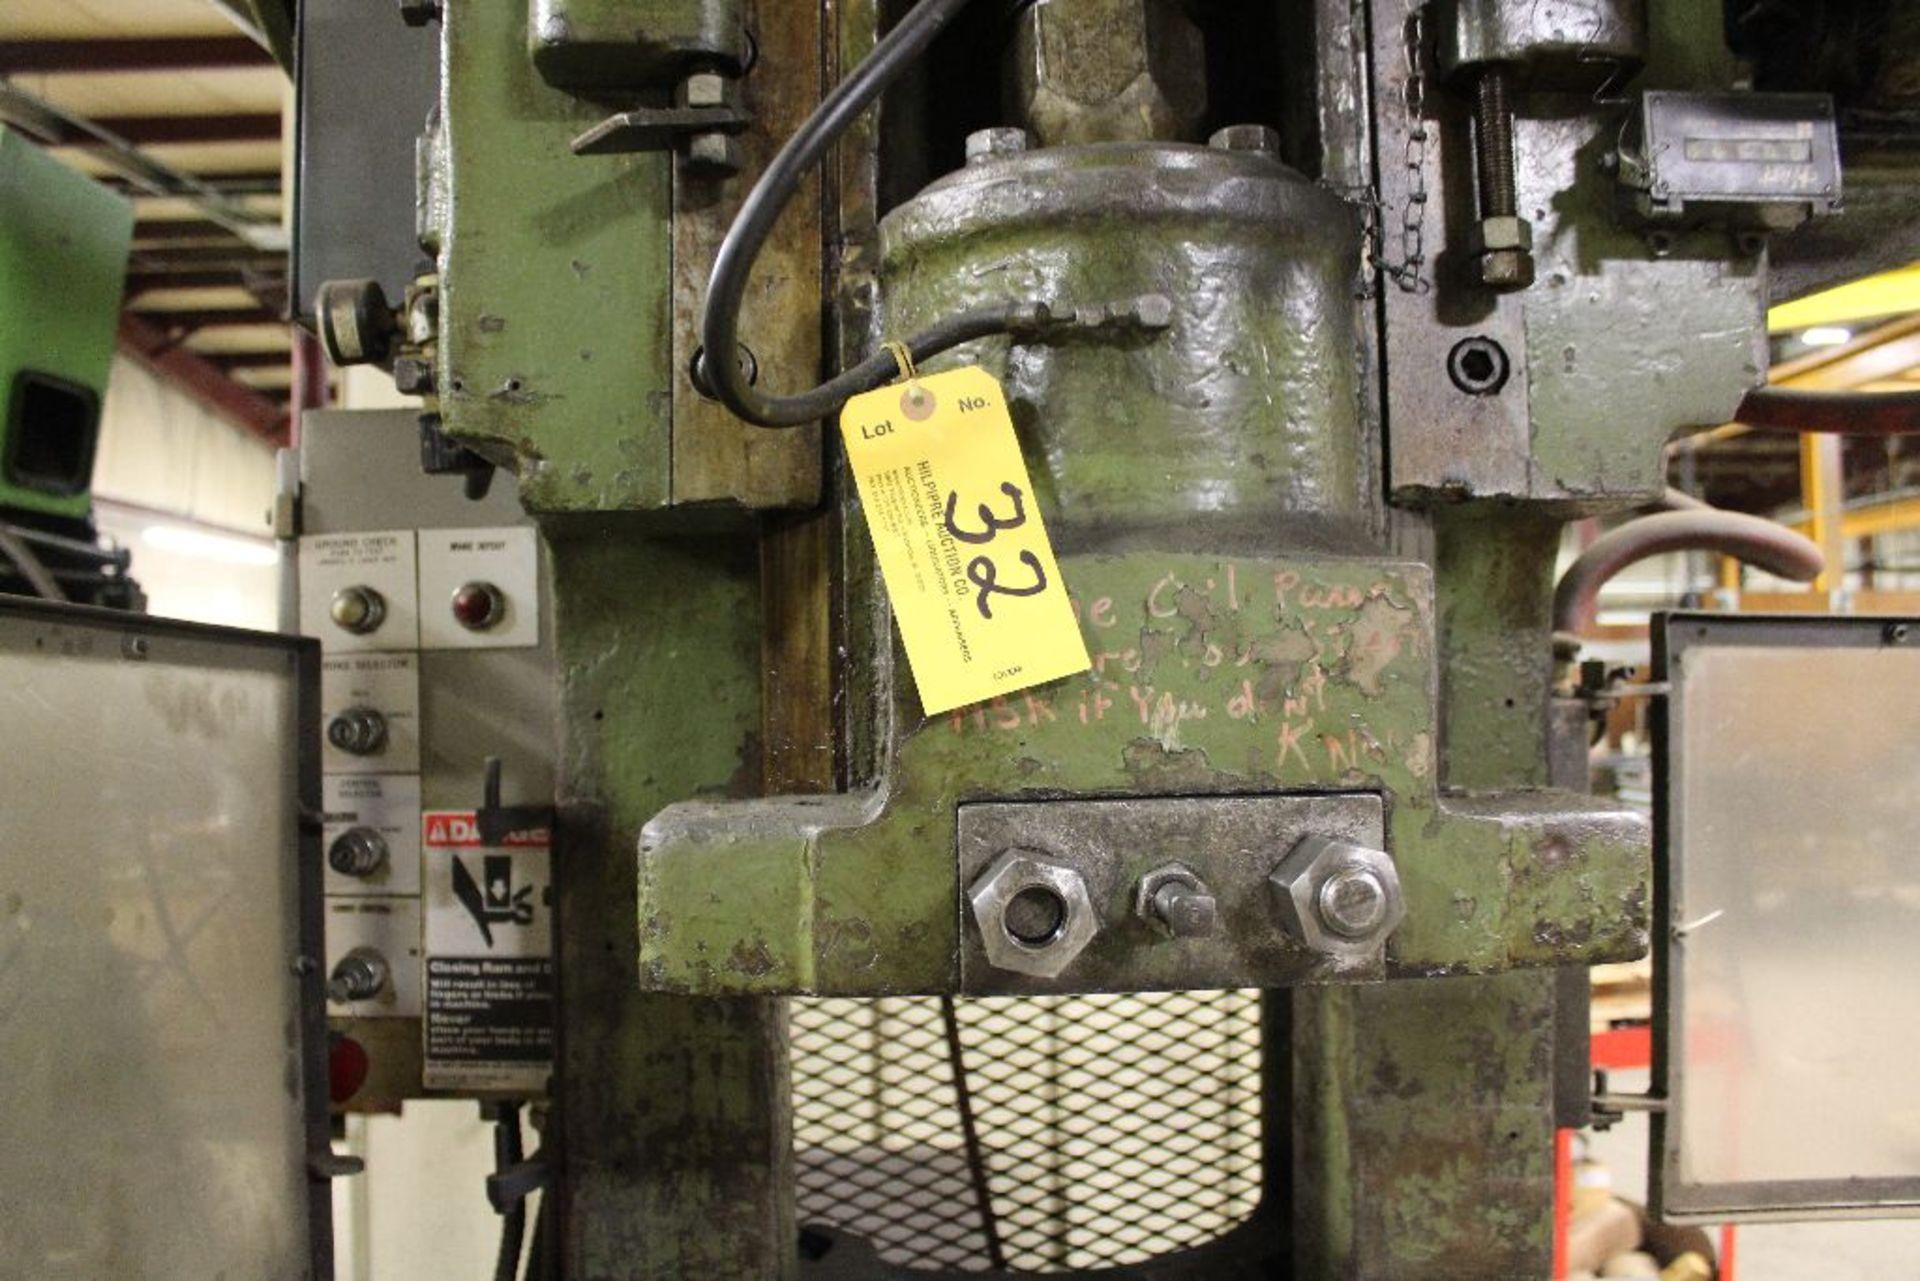 Lot 032 - 1968 Bliss OBI press, sn H59703; H45828, 60 T., Stroke 8, shut height, air cushion, photo electric